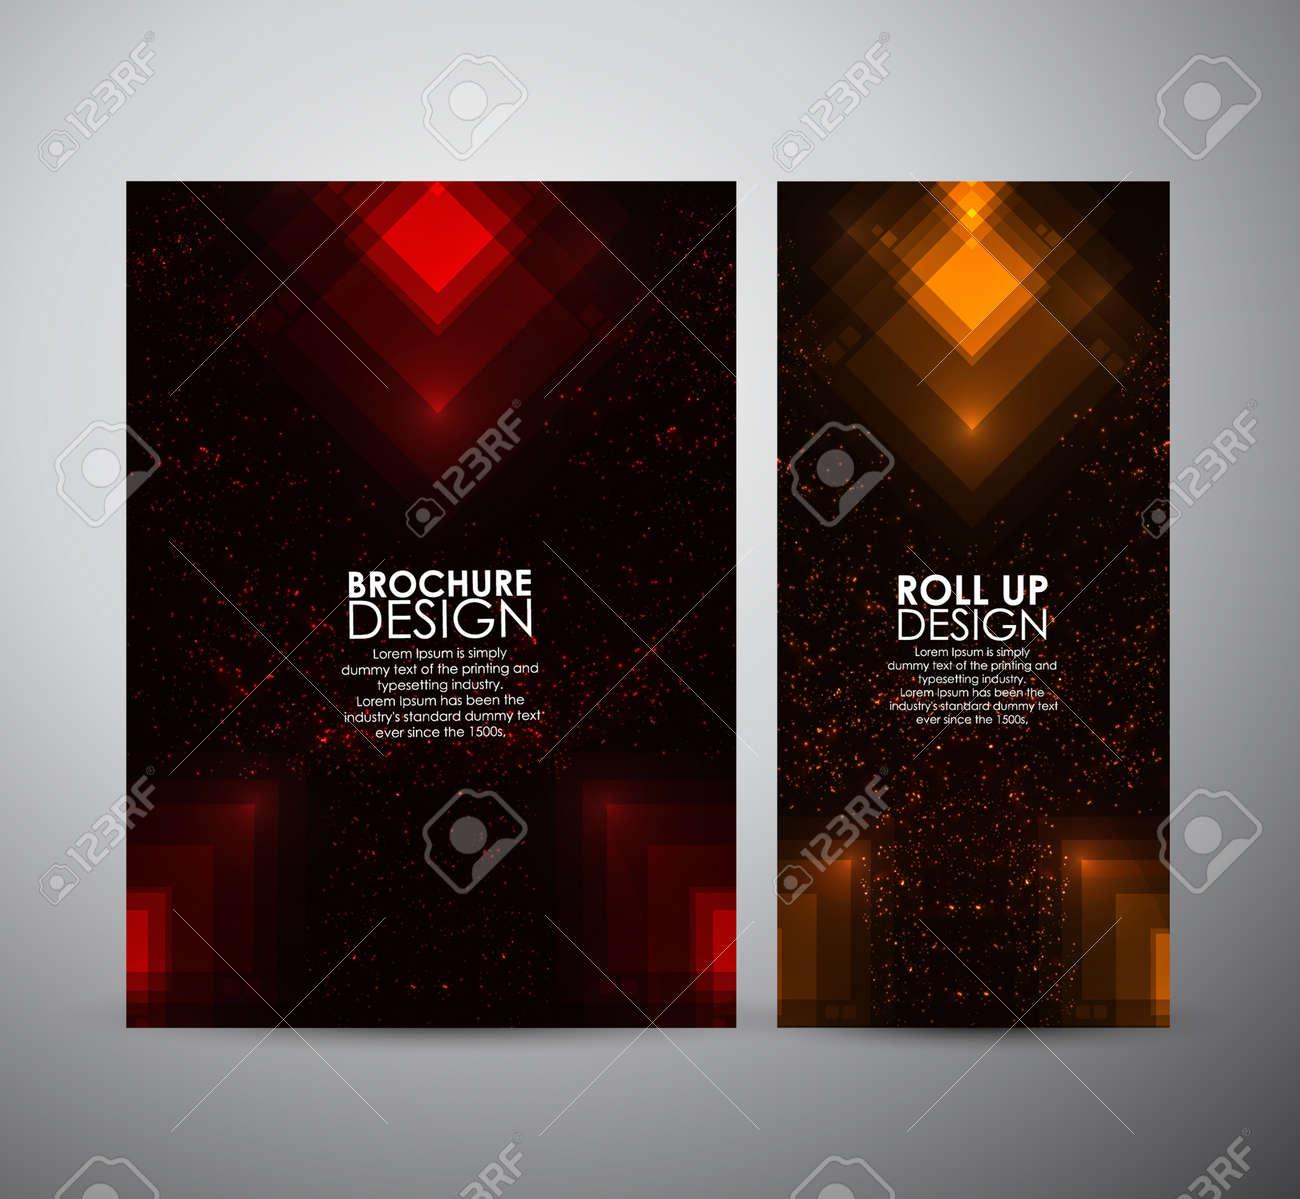 Abstrakt Quadrate Leuchtenden Muster. Broschüre Business-Design ...